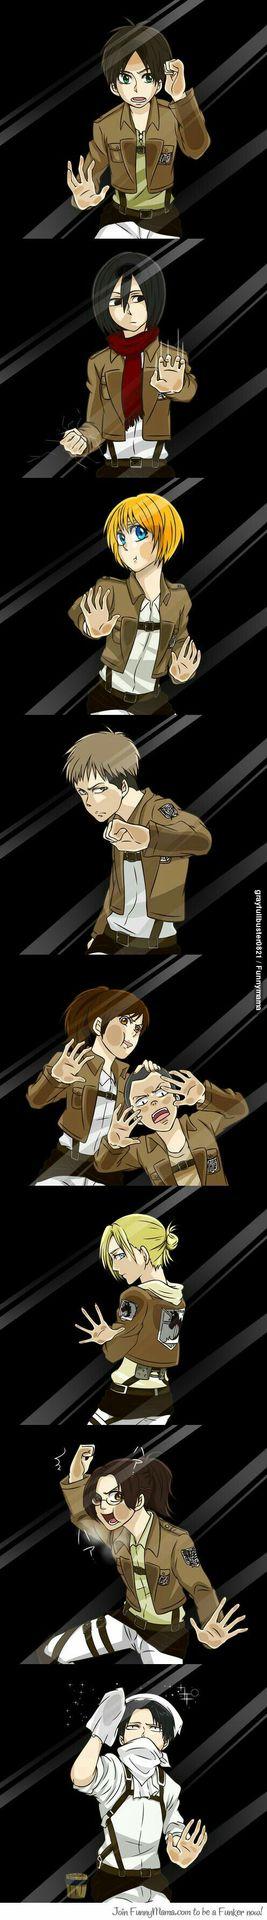 Anime Pics! - Attack on Titan